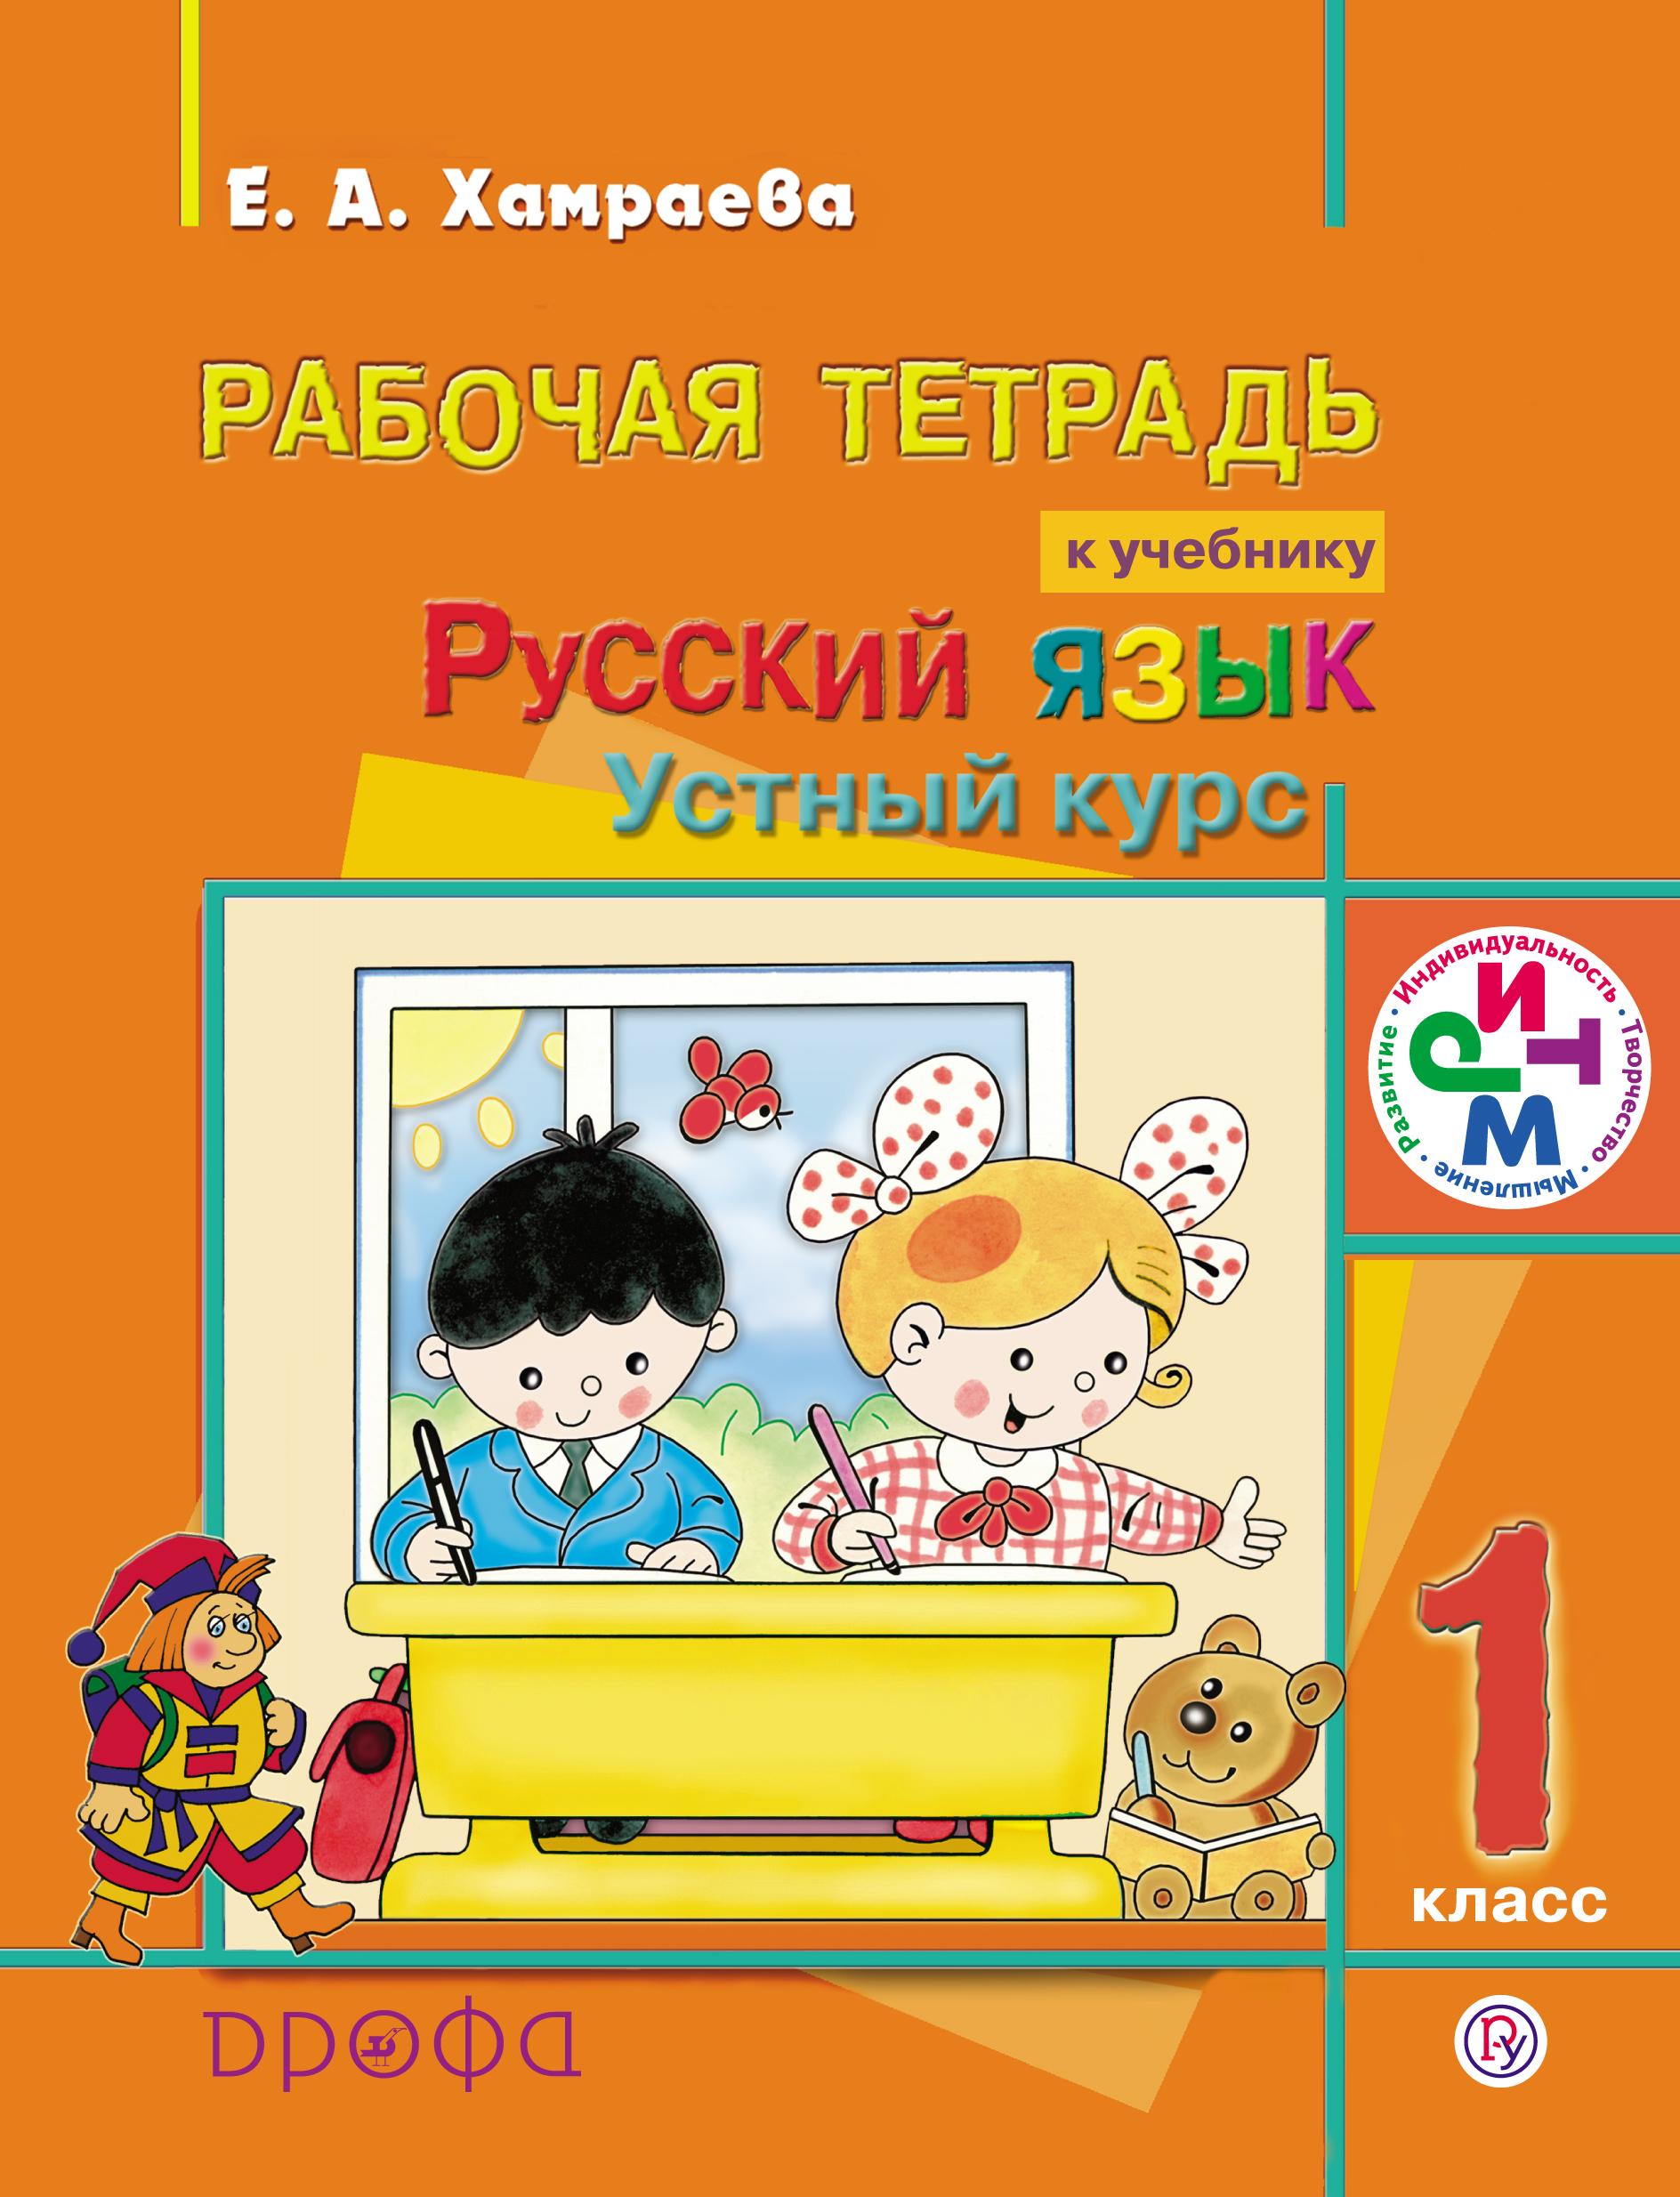 Русский язык. Устный курс. 1 класс. Рабочая тетрадь